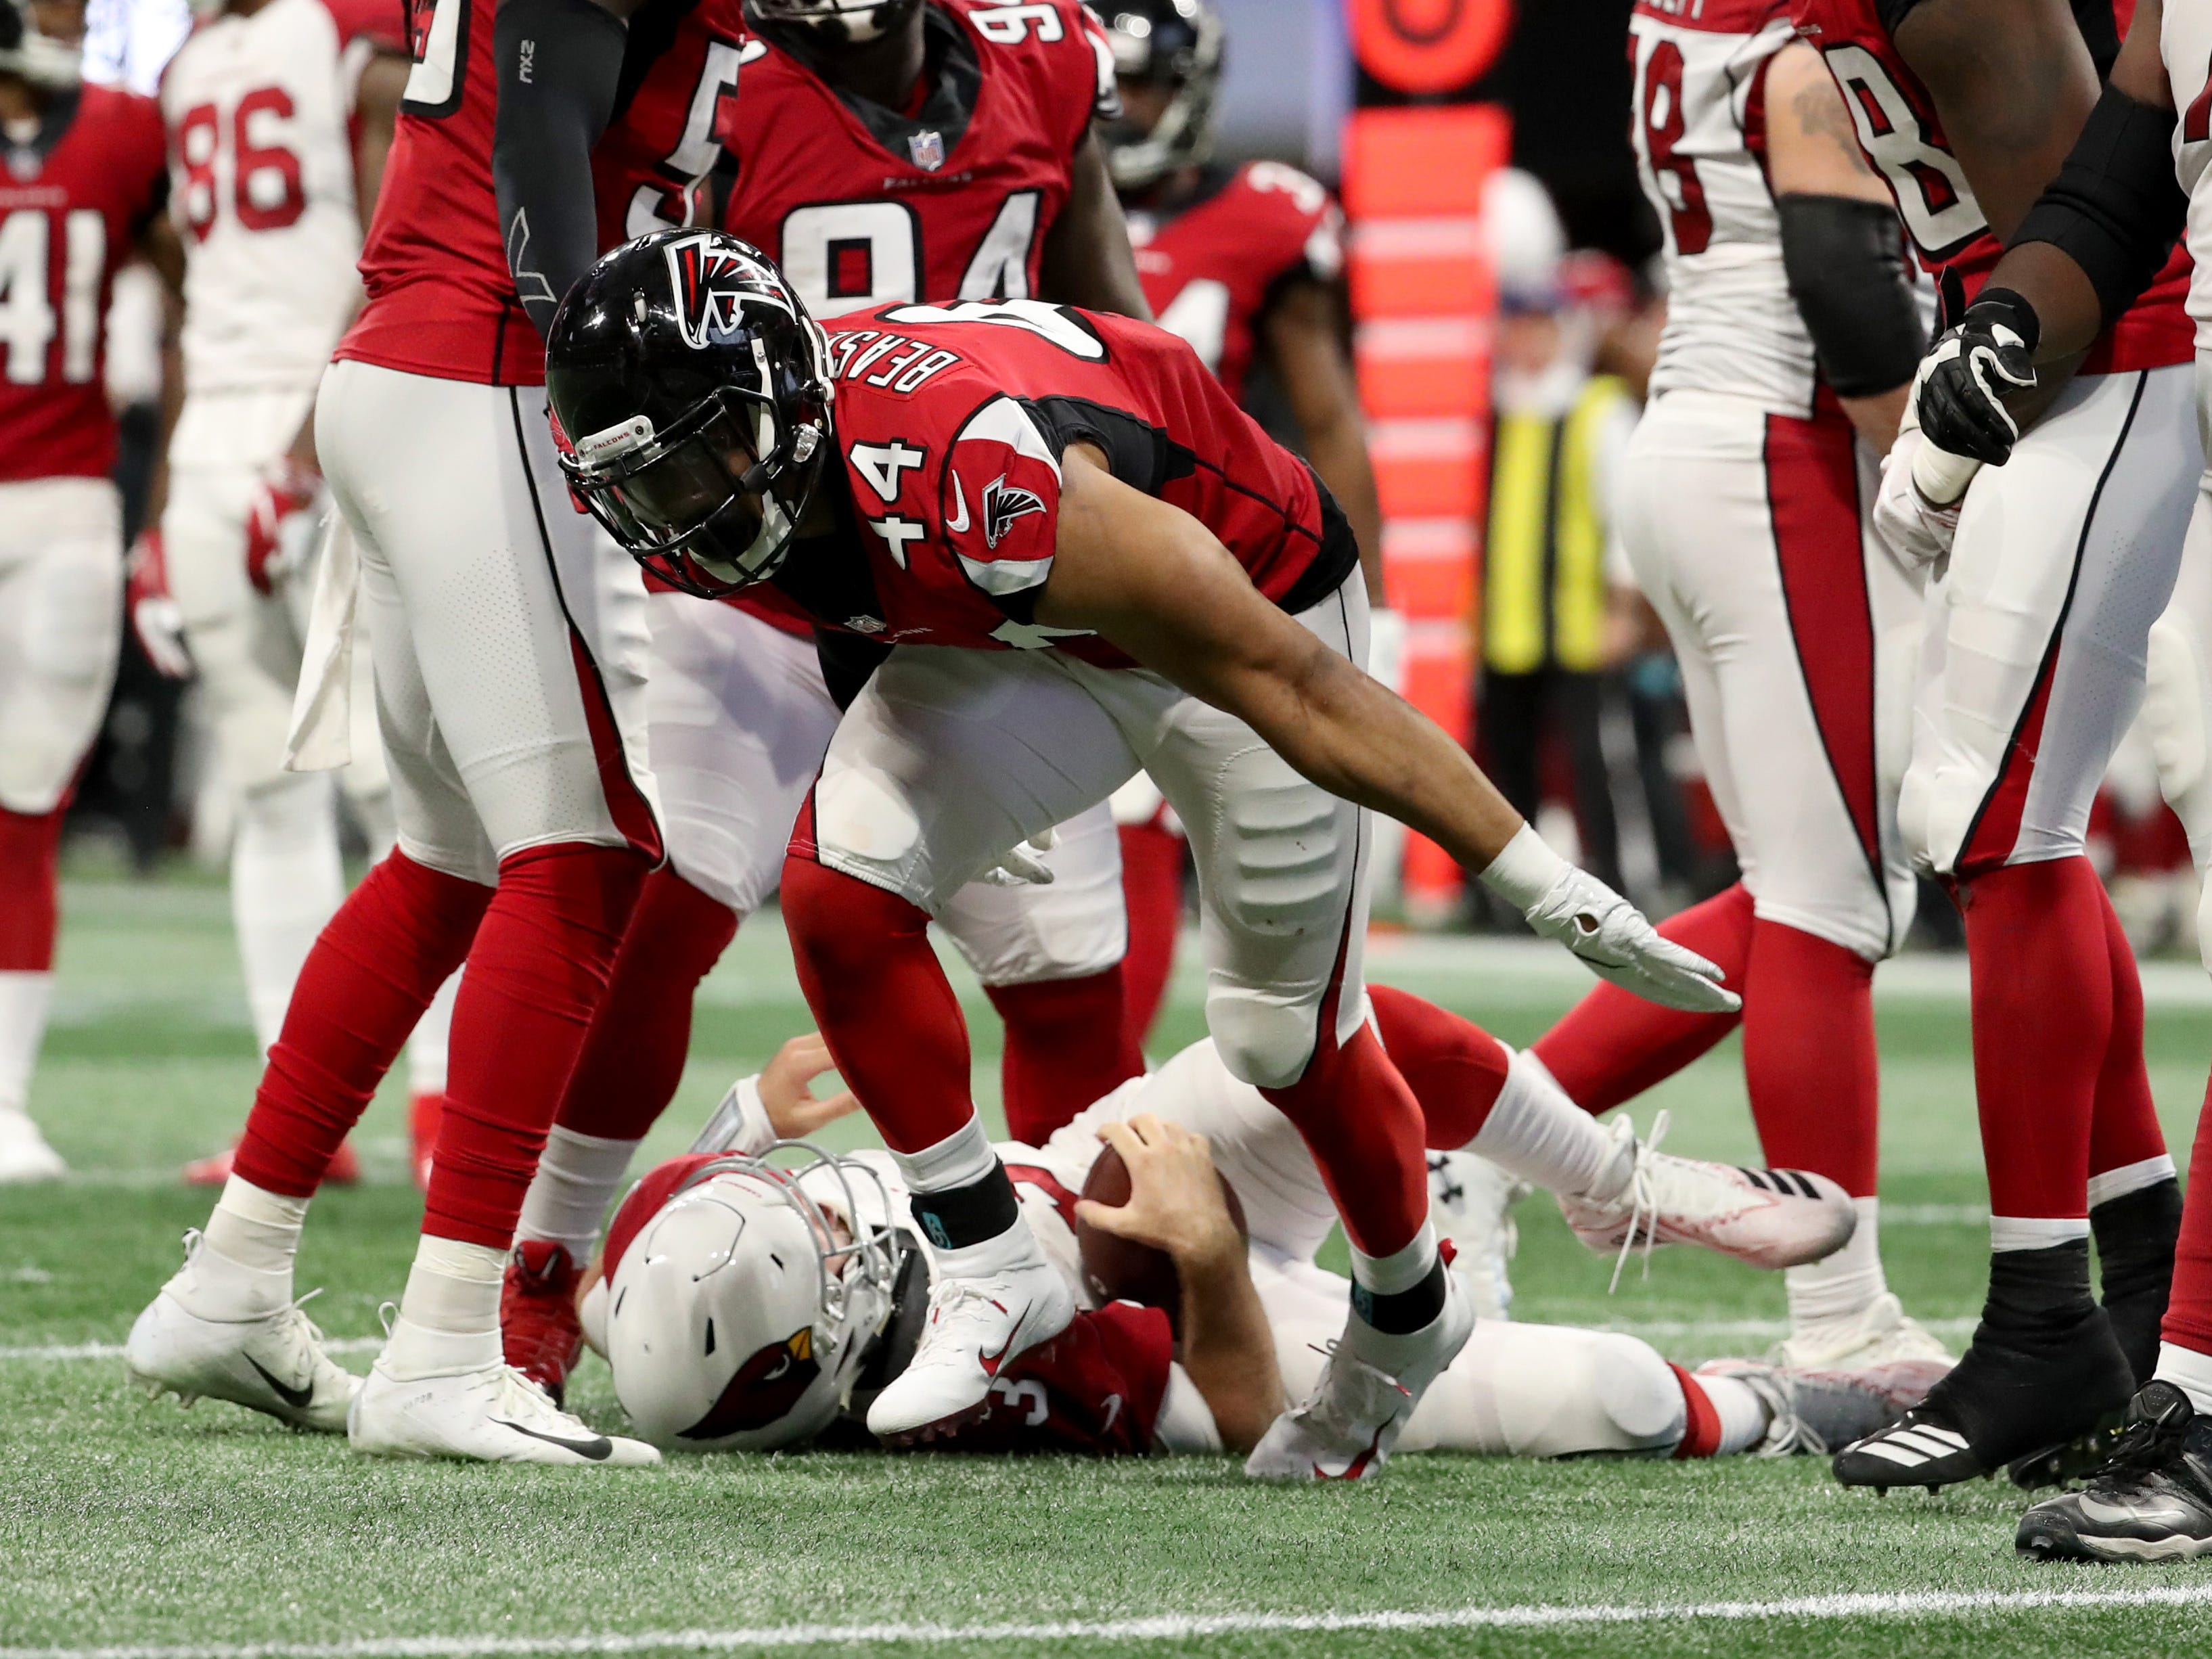 Atlanta Falcons defensive end Vic Beasley (44) reacts after sacking Arizona Cardinals quarterback Josh Rosen (3) in the fourth quarter at Mercedes-Benz Stadium.